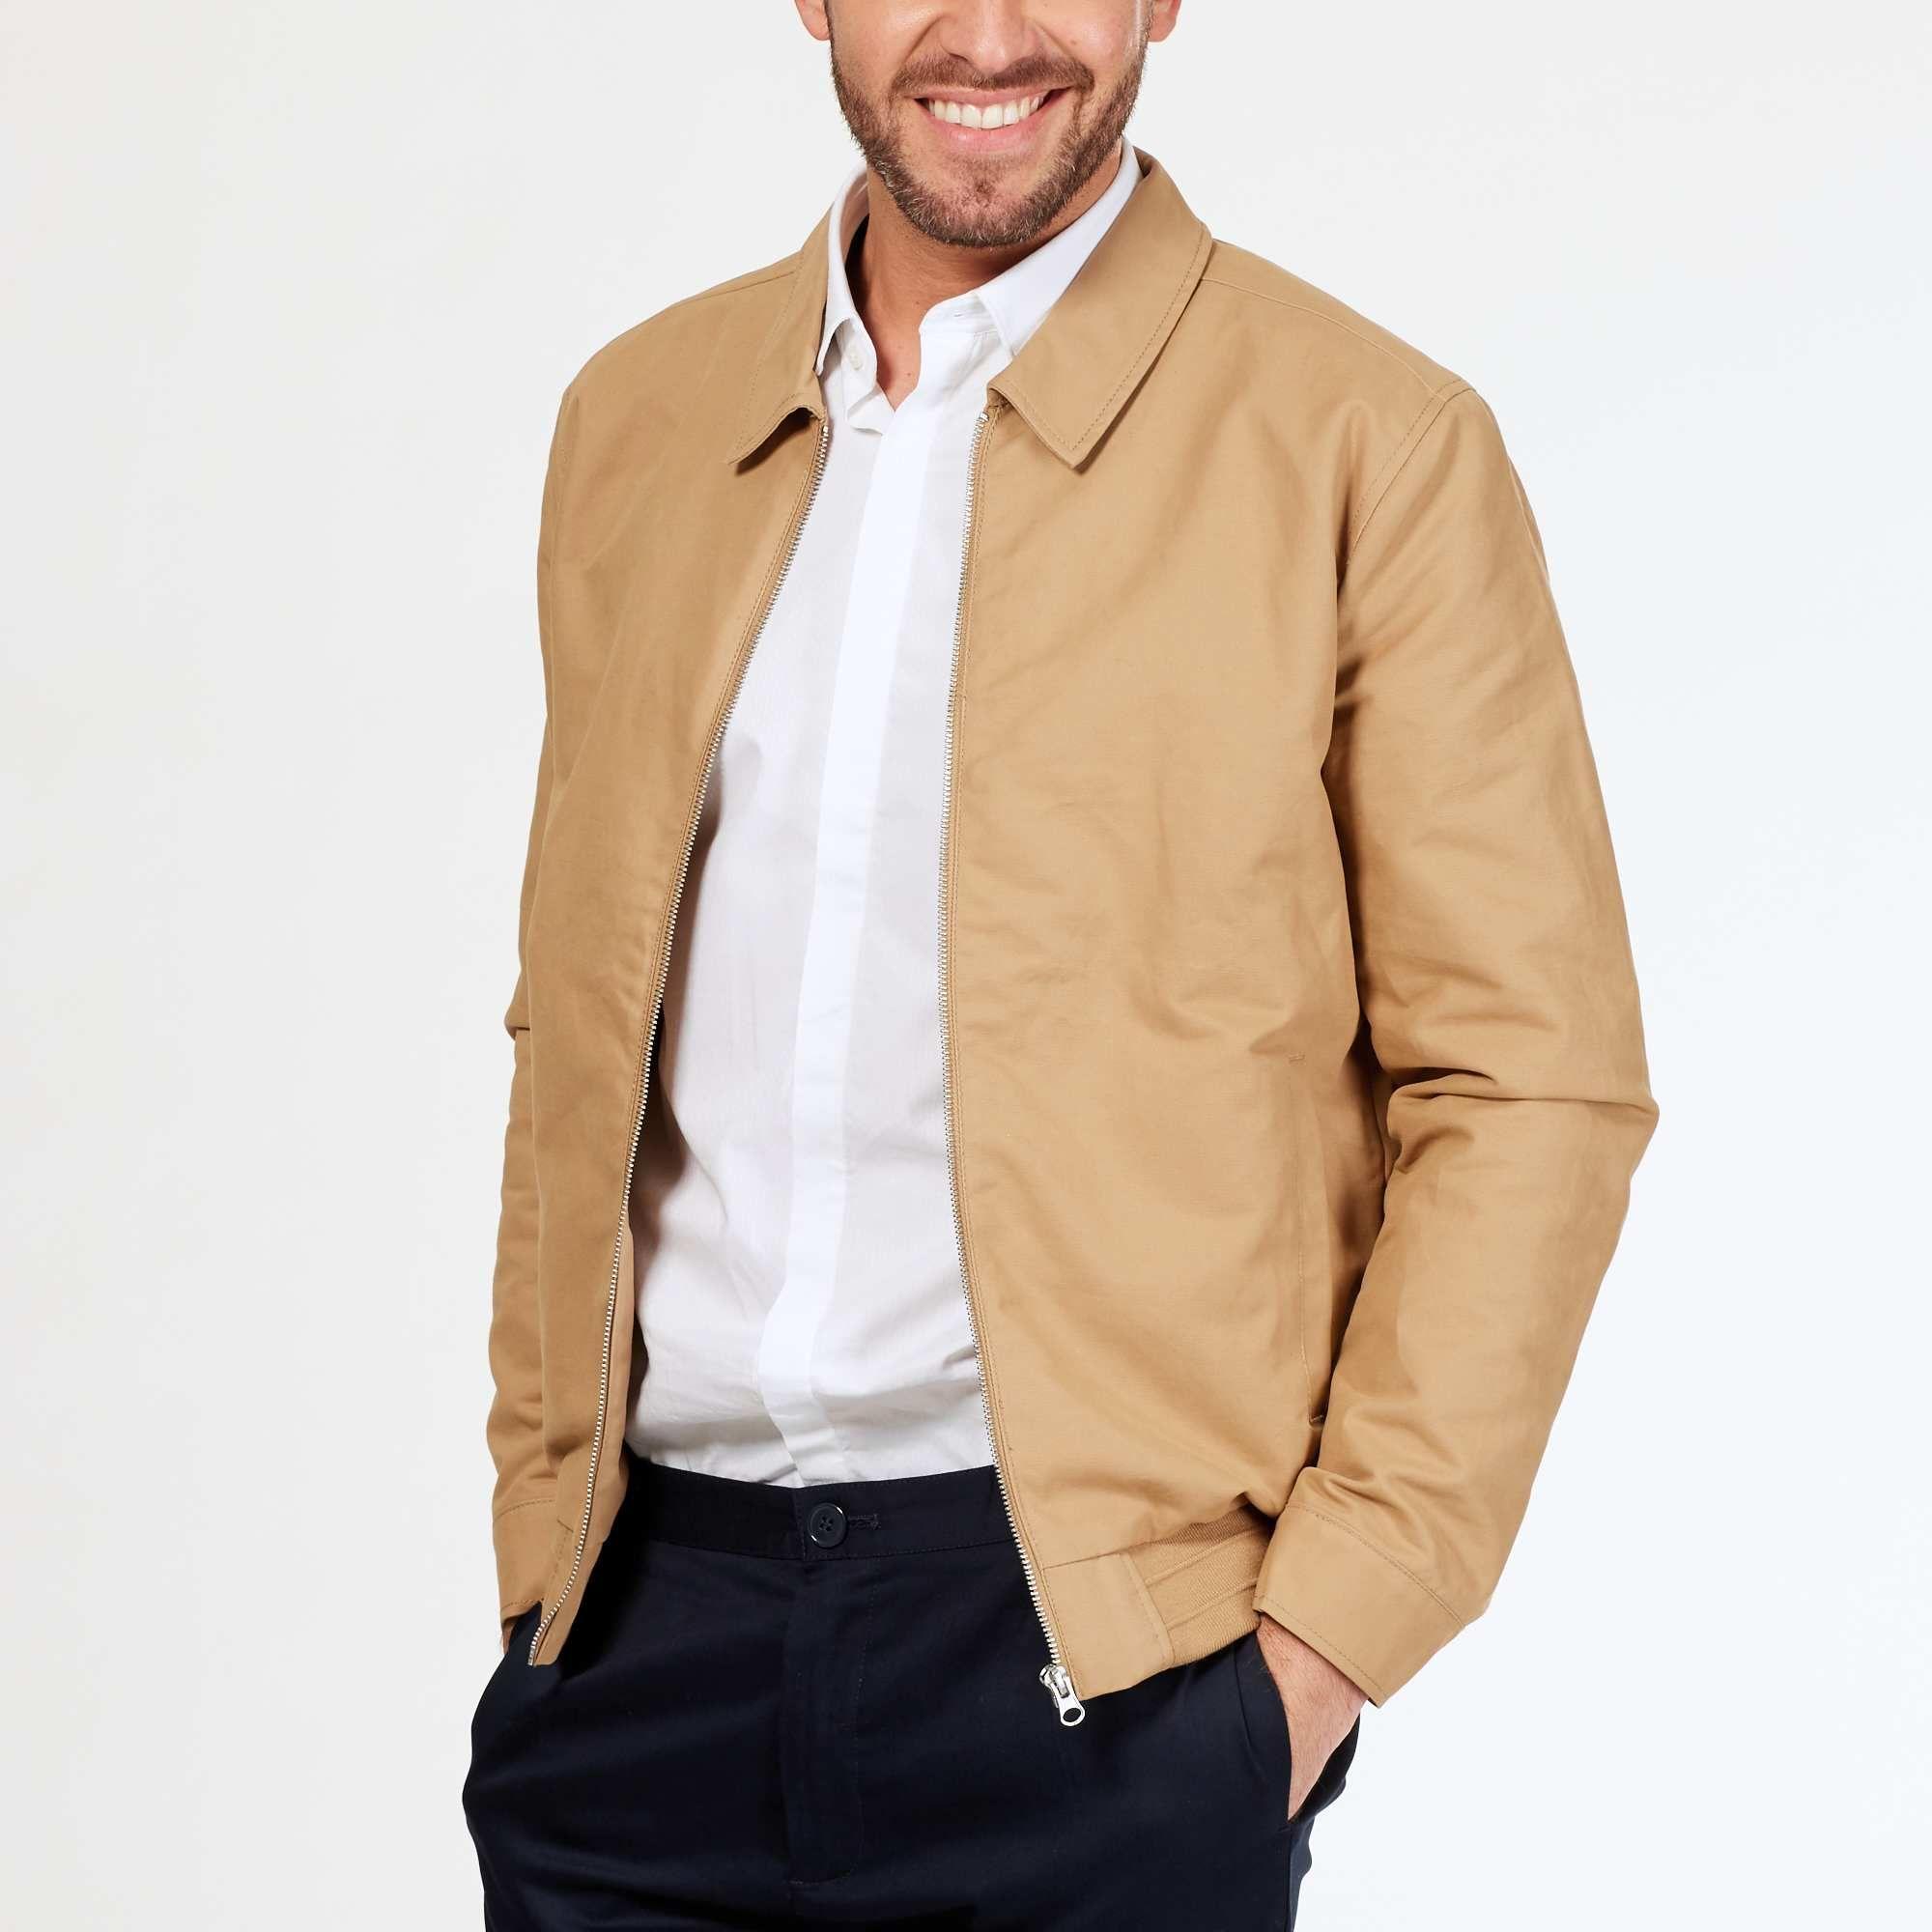 Blouson léger en coton Homme - Kiabi - 30,00€